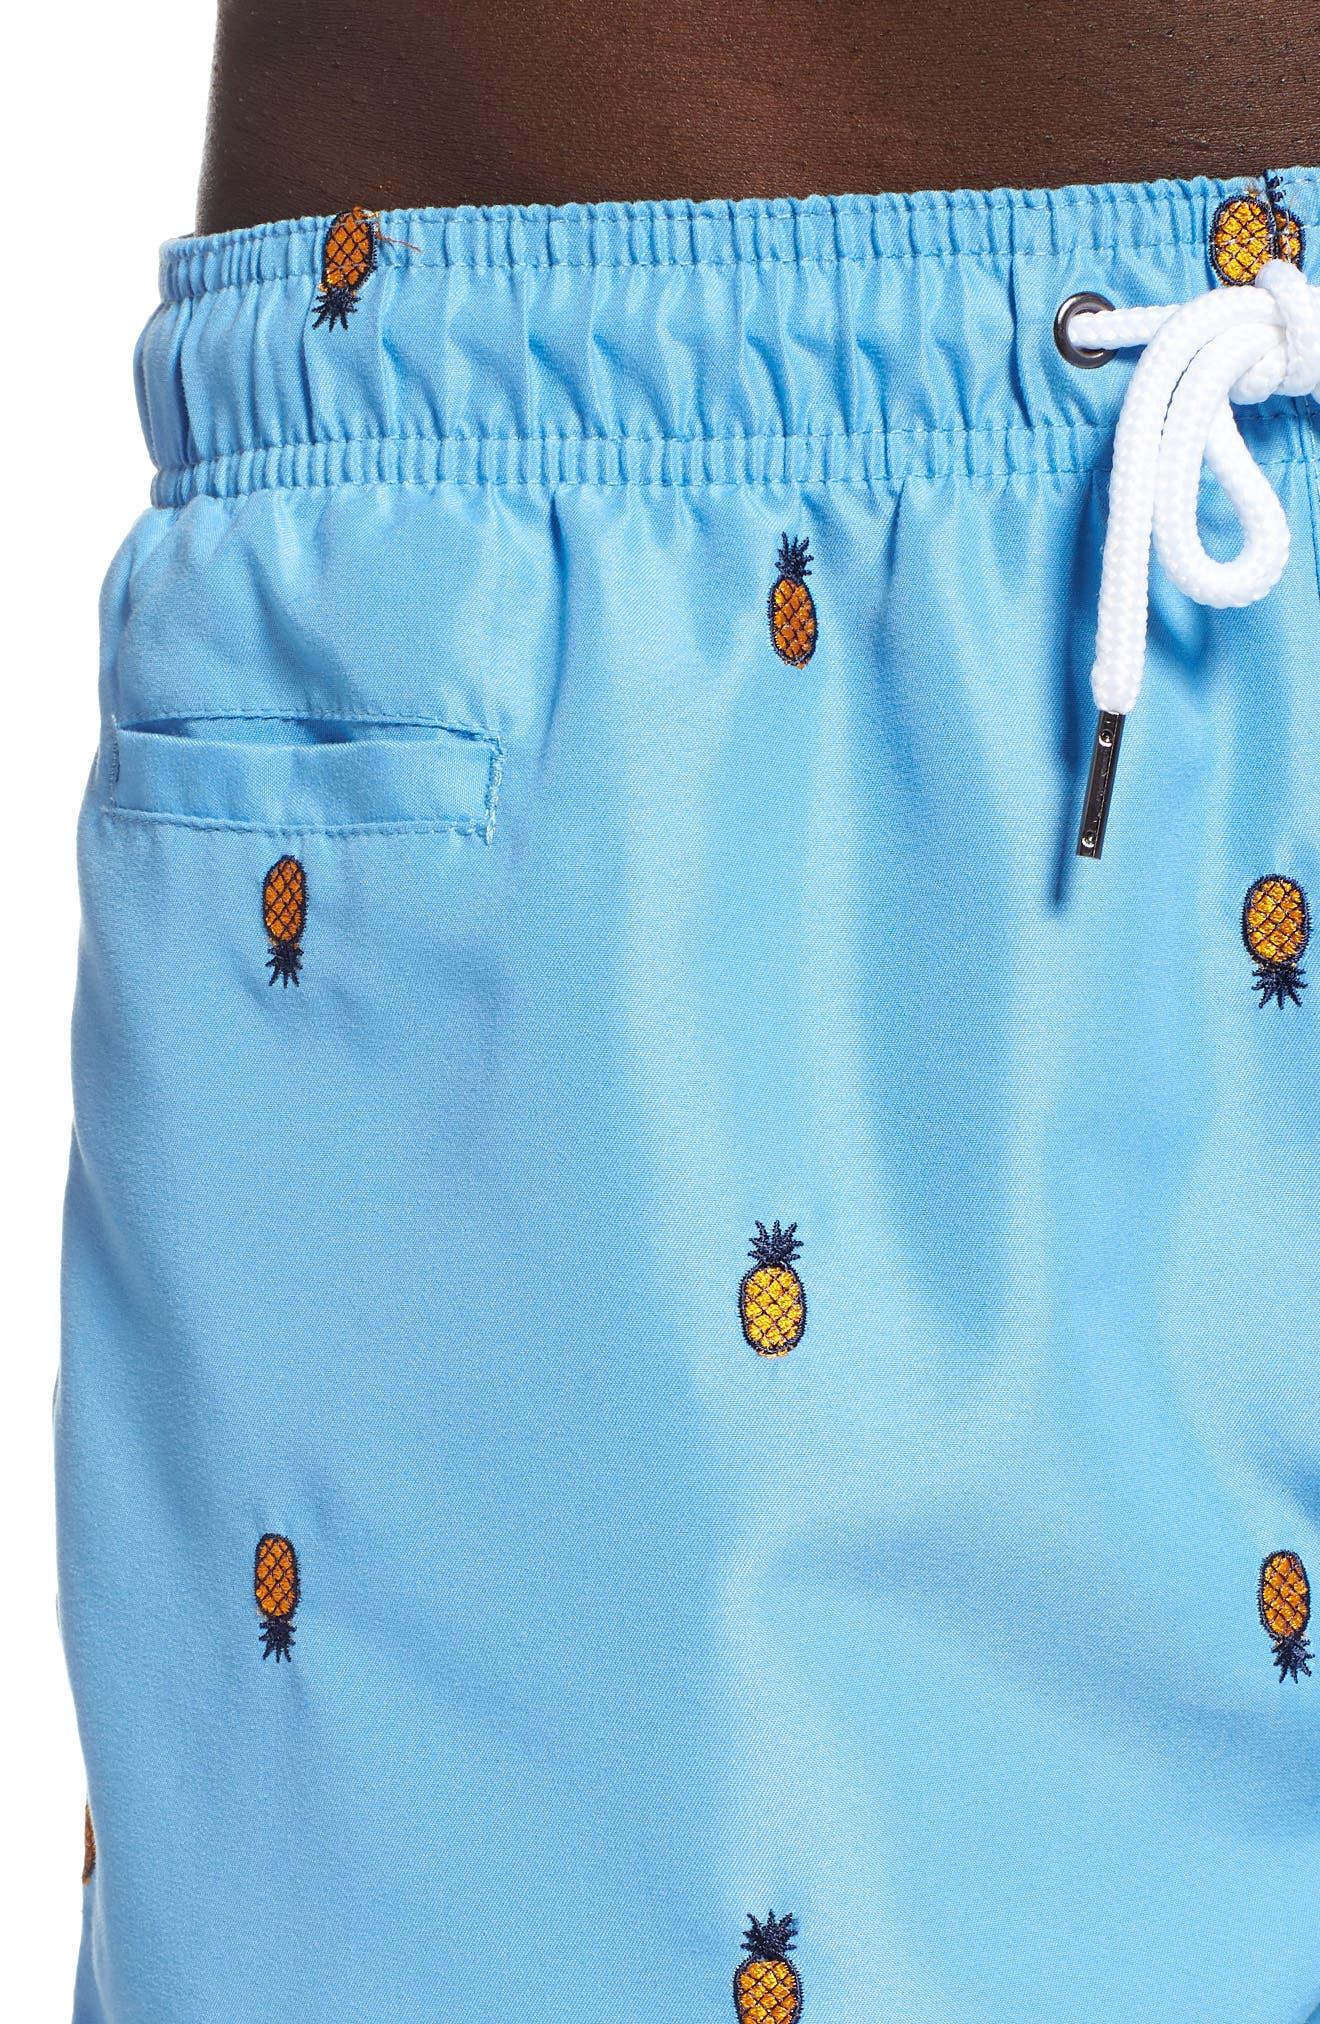 Premium Embroidered Sano Swim Trunks,                             Alternate thumbnail 4, color,                             PERISIAN BLUE